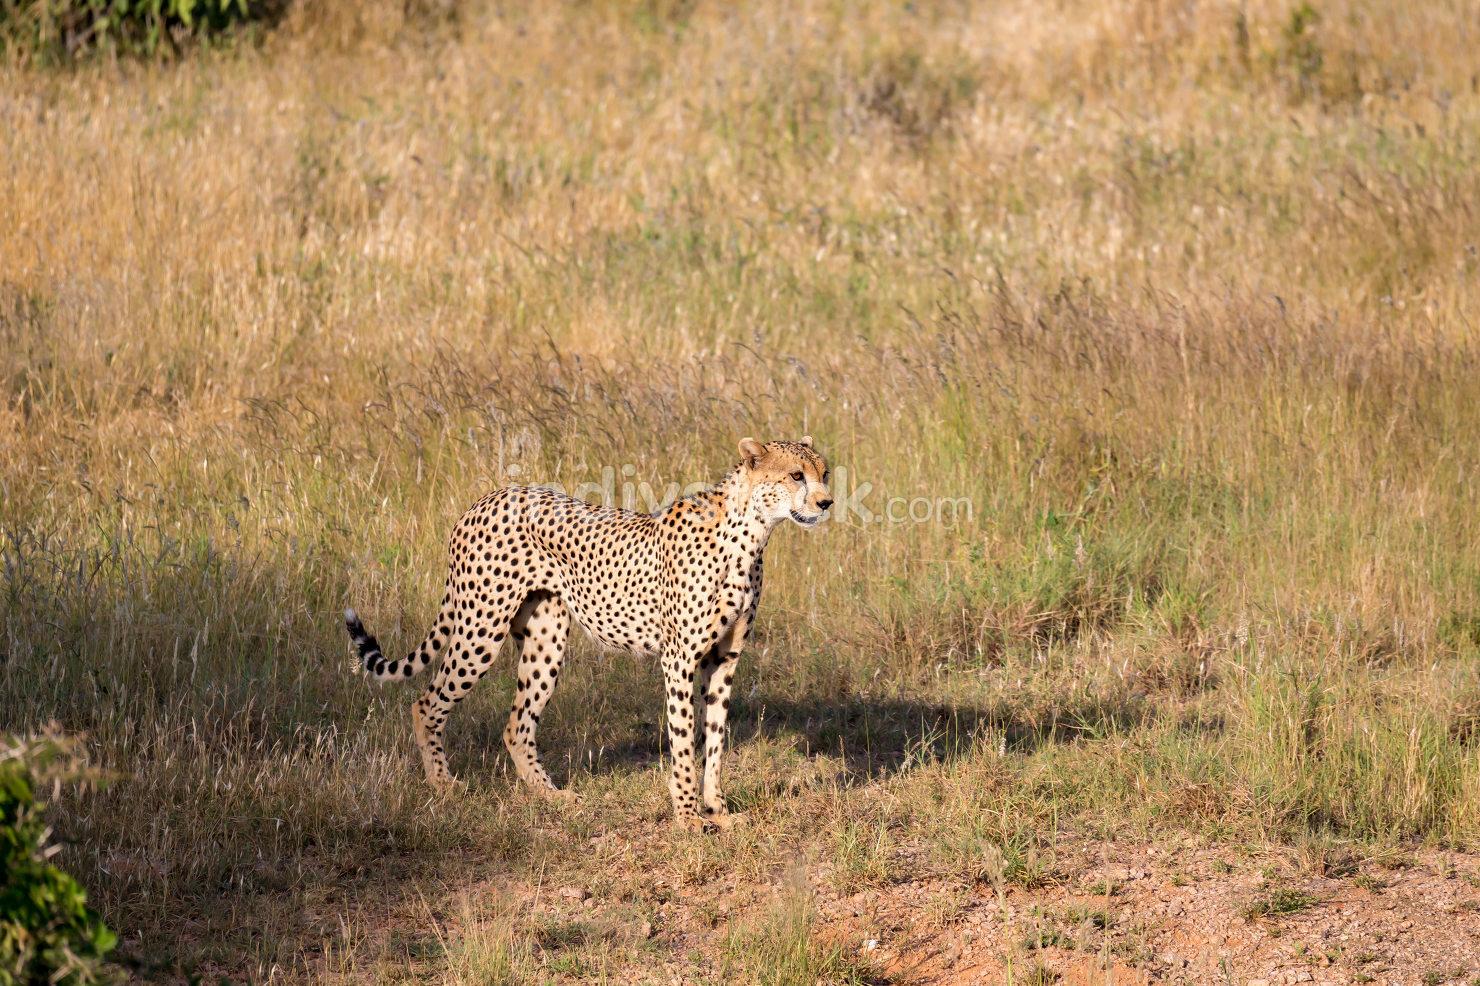 Cheetah in the grassland of the savannah in Kenya